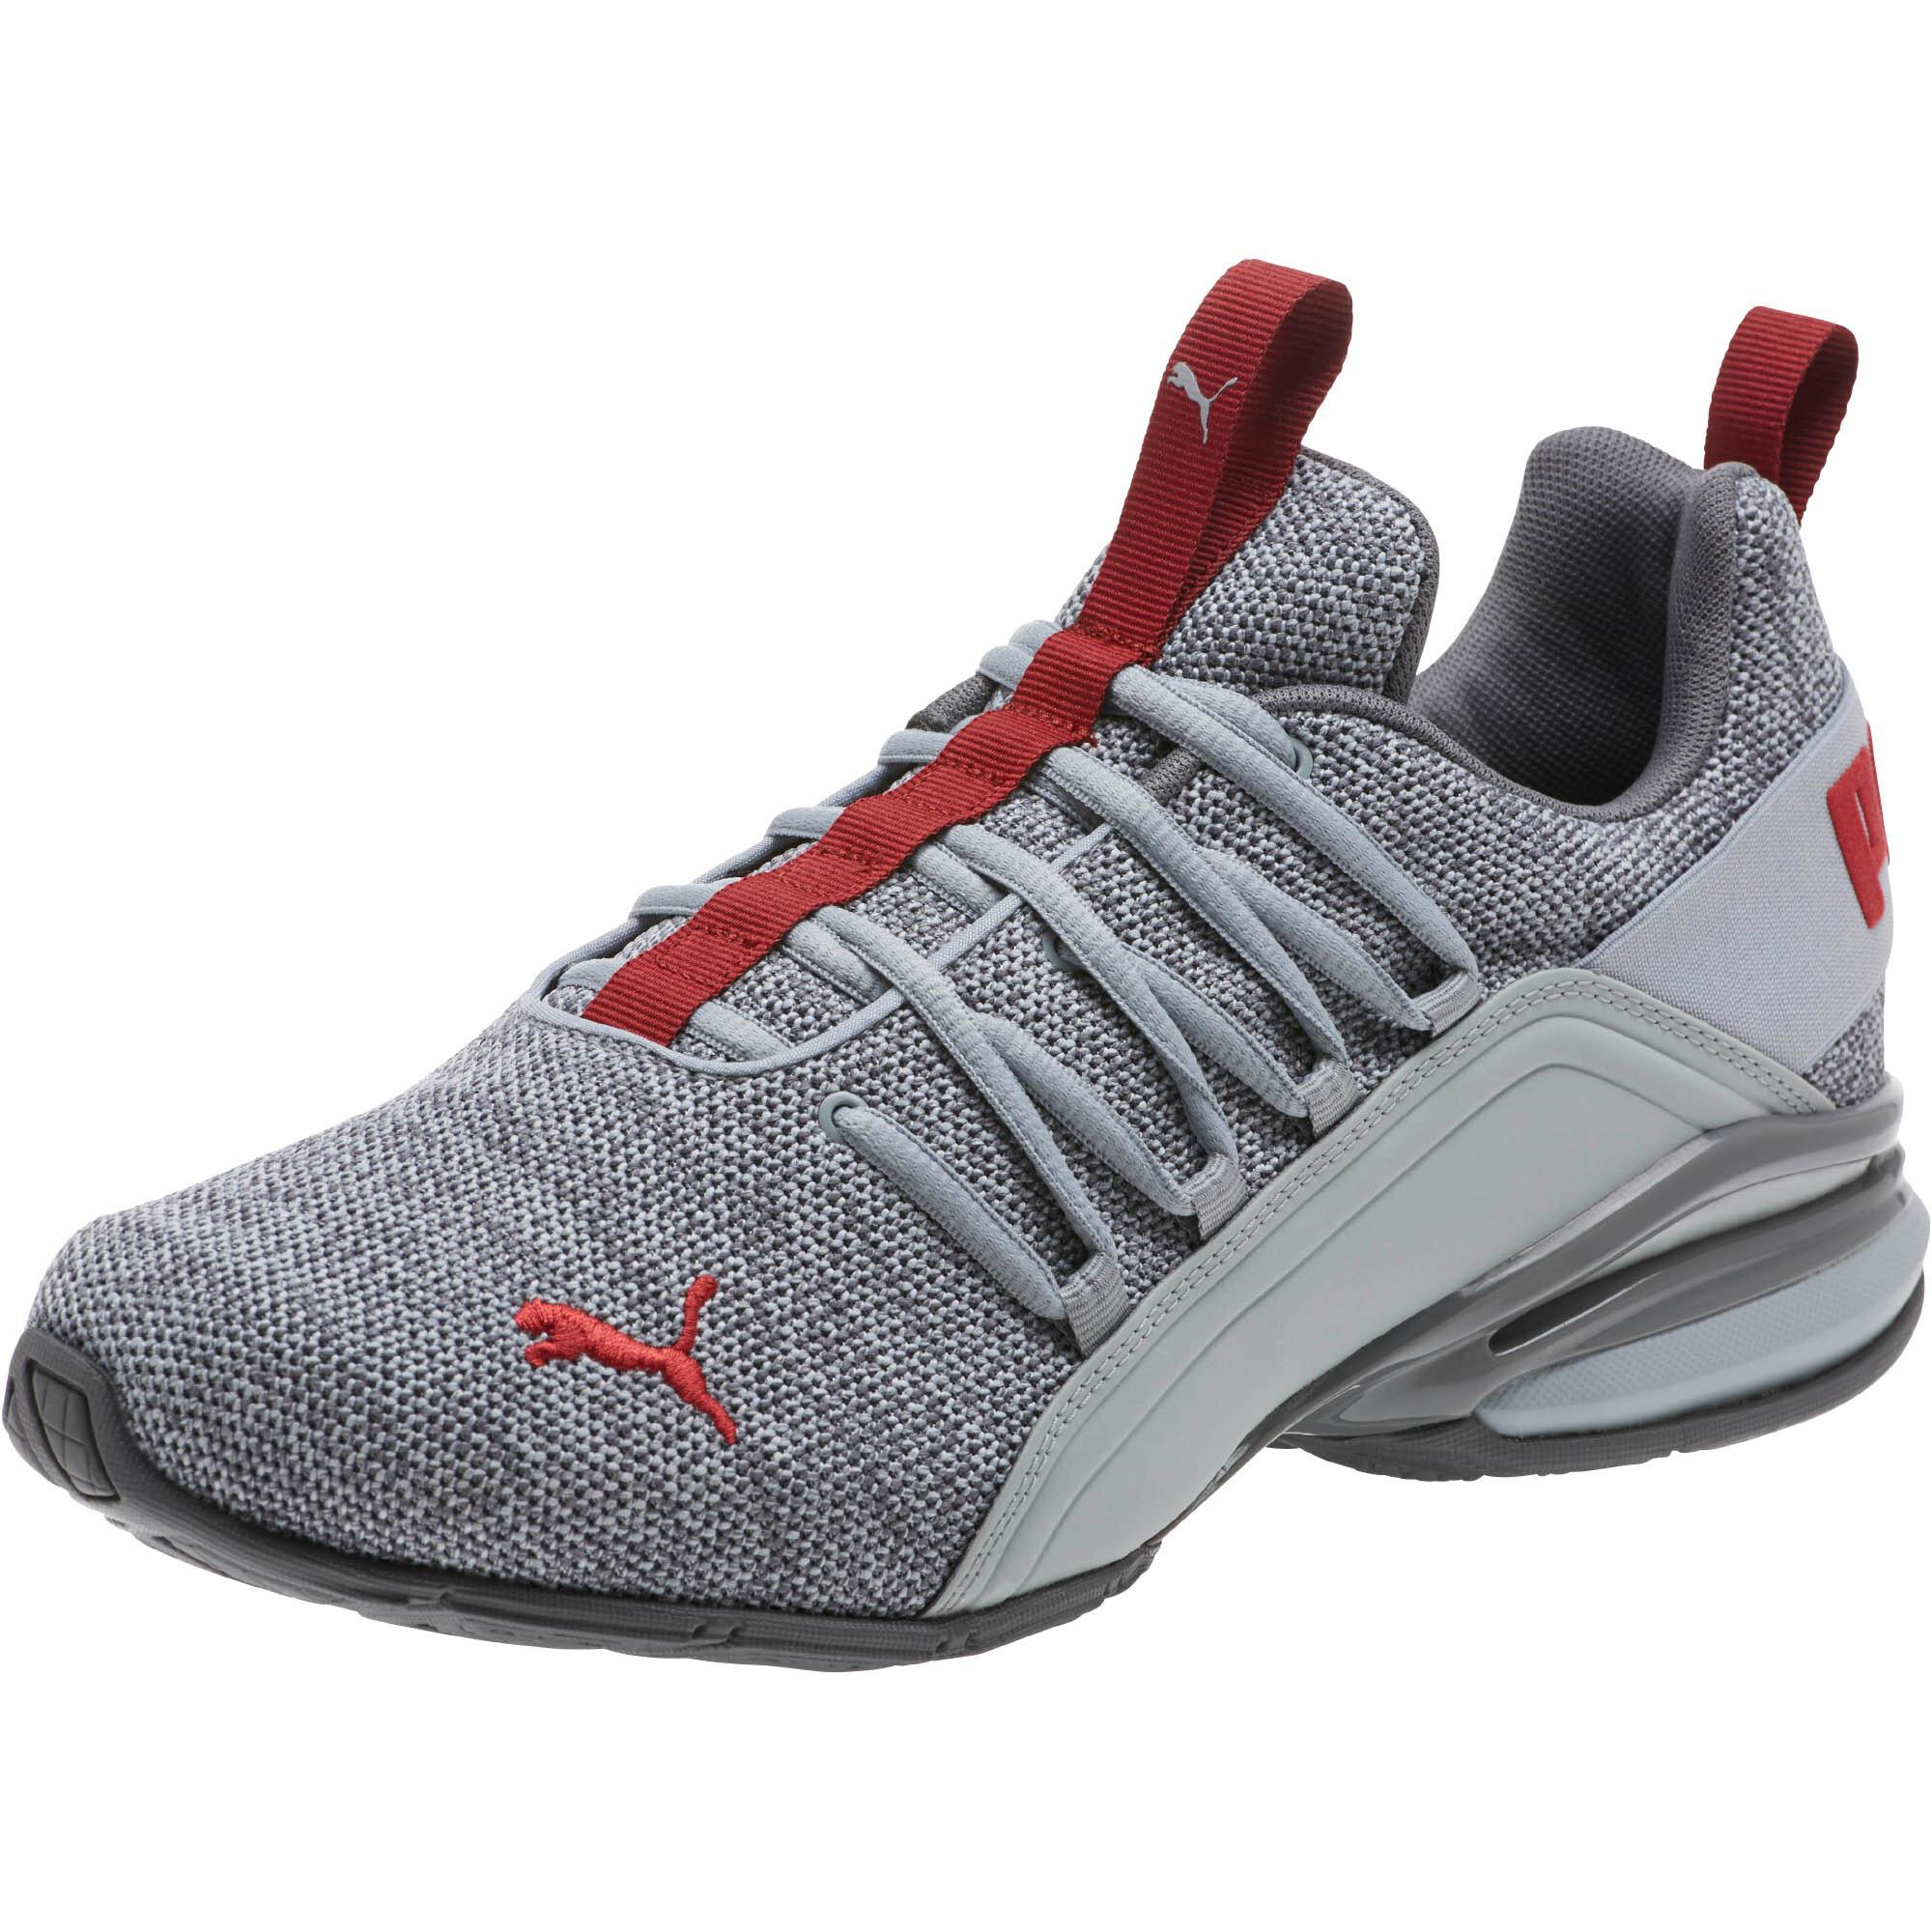 PUMA-Axelion-Men-039-s-Training-Shoes-Men-Shoe-Running thumbnail 5